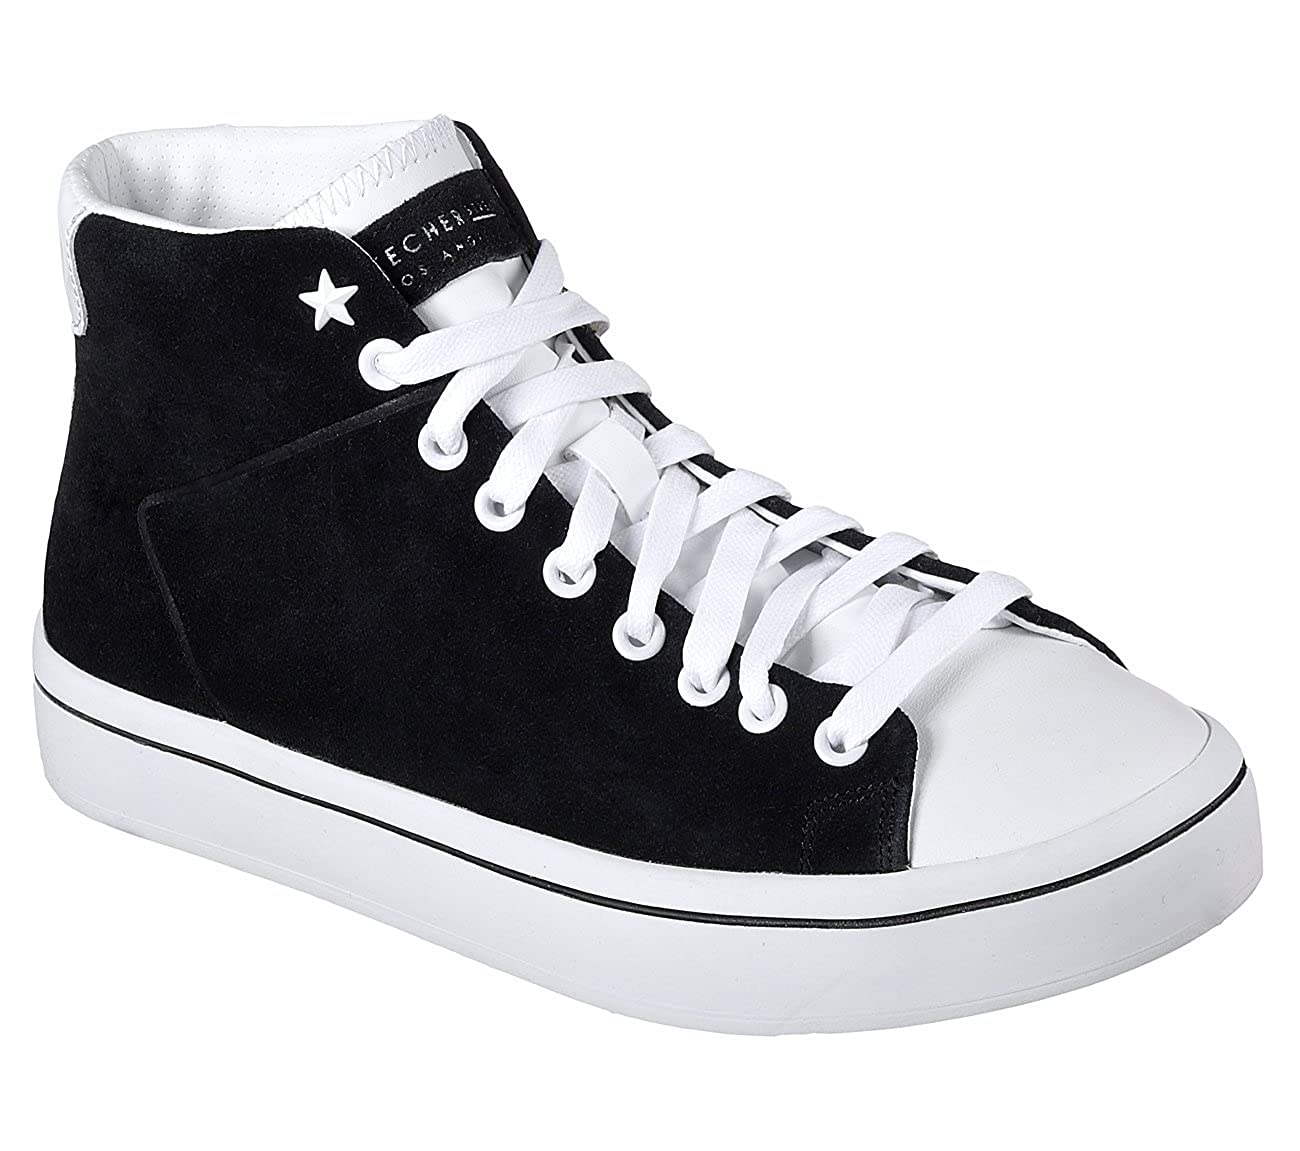 Skechers Street Damen High Top Sneaker H-Lite Sugar High Schwarz  39 EU